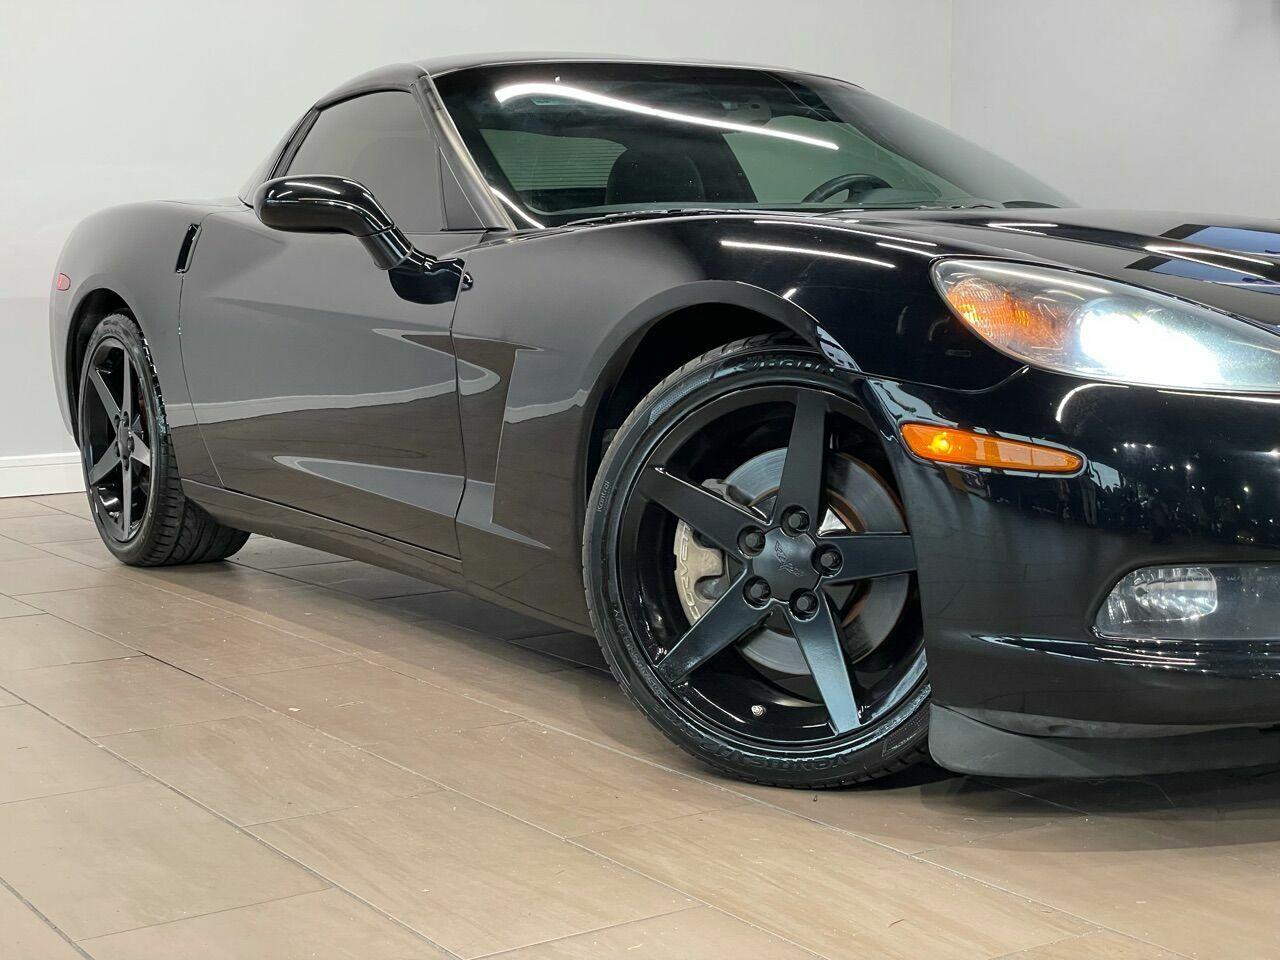 2010 Black Chevrolet Corvette     C6 Corvette Photo 10